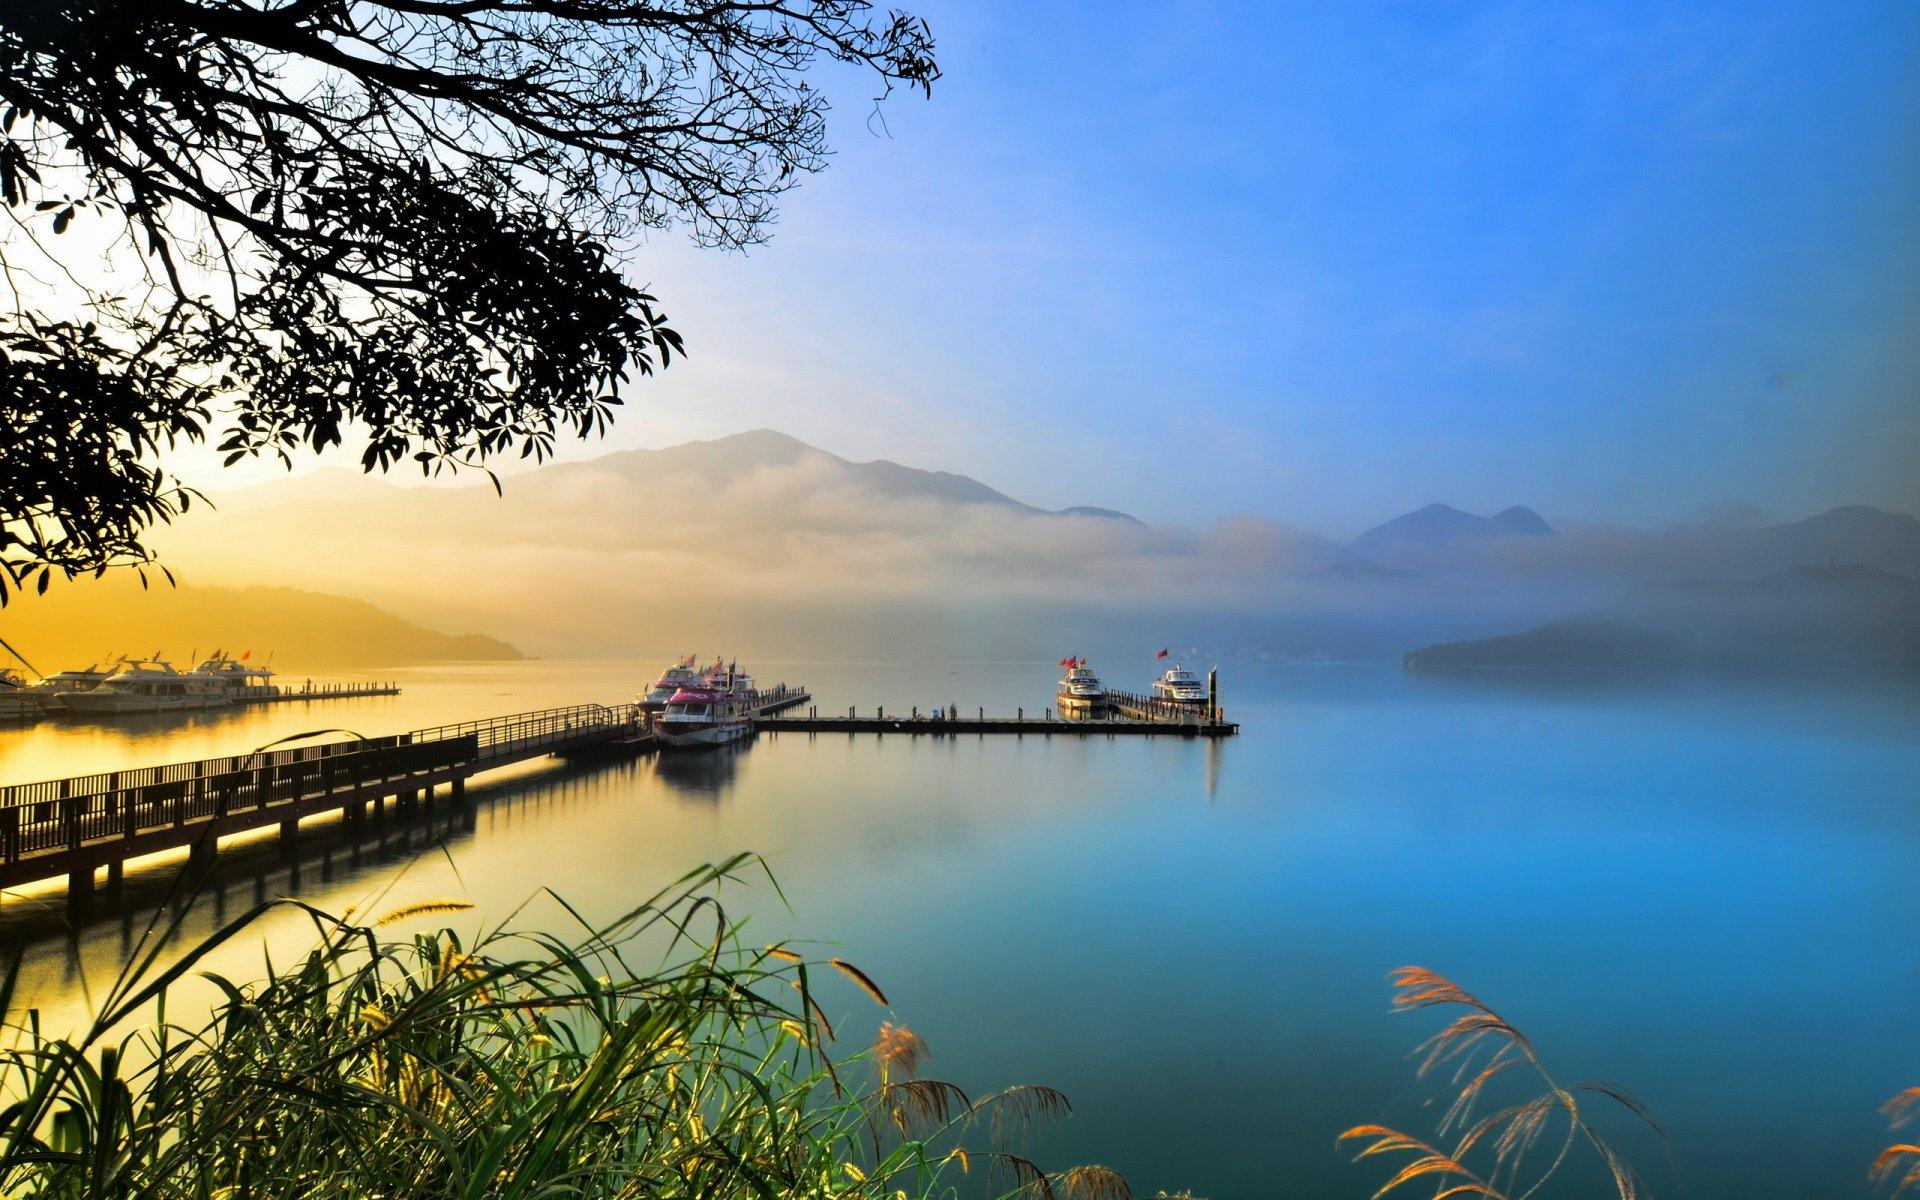 Amazing Lake Pictures